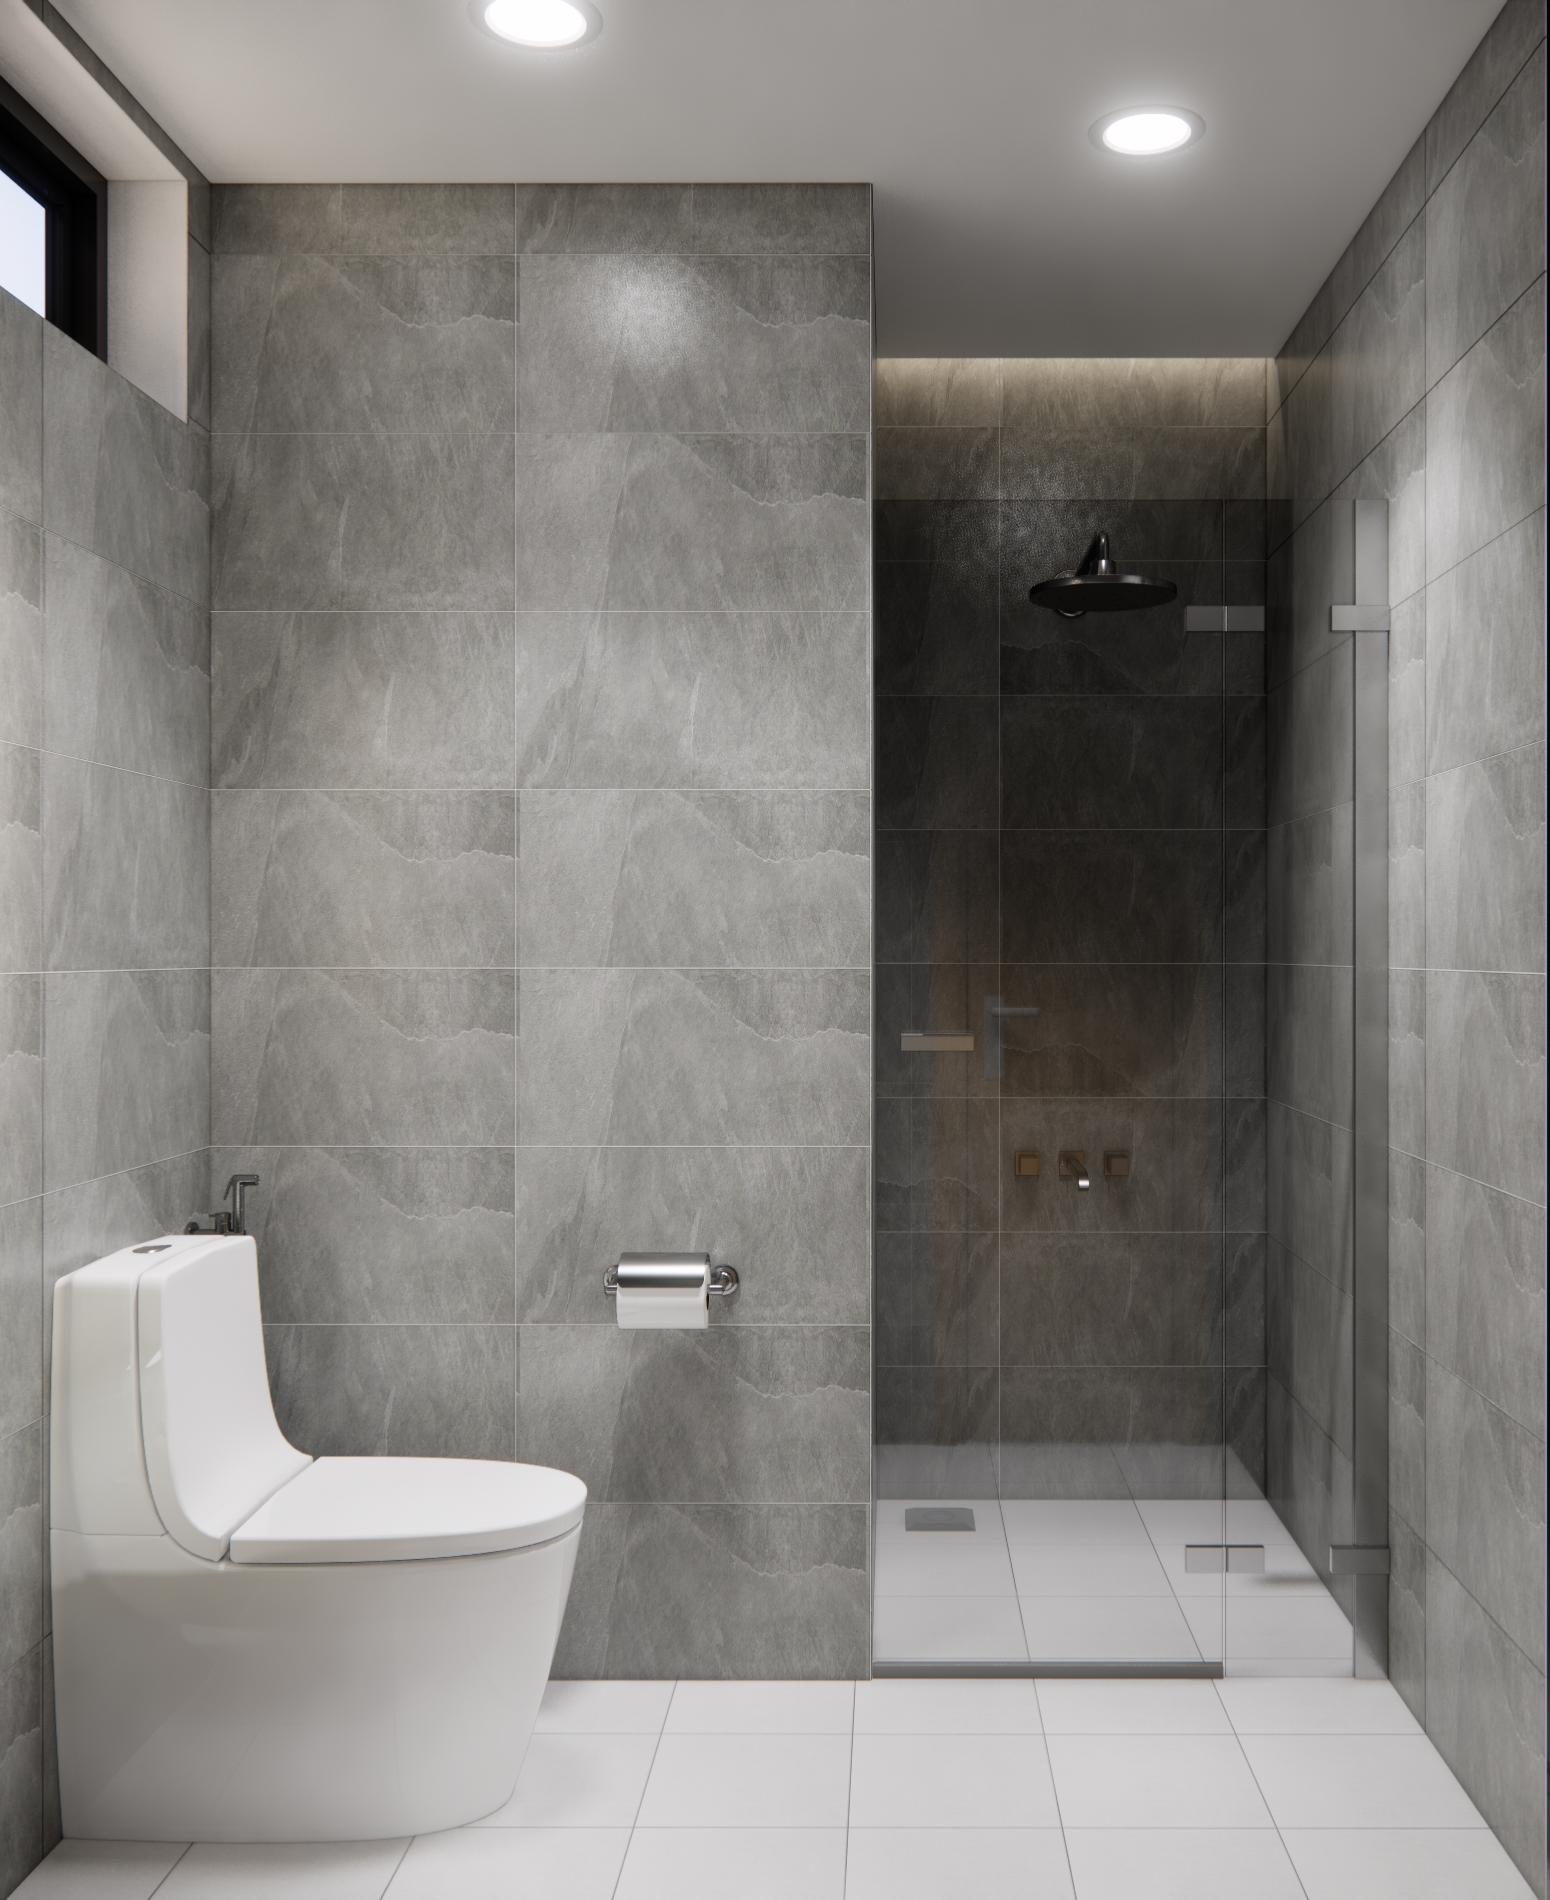 thiết kế căn hộ him lam (2)